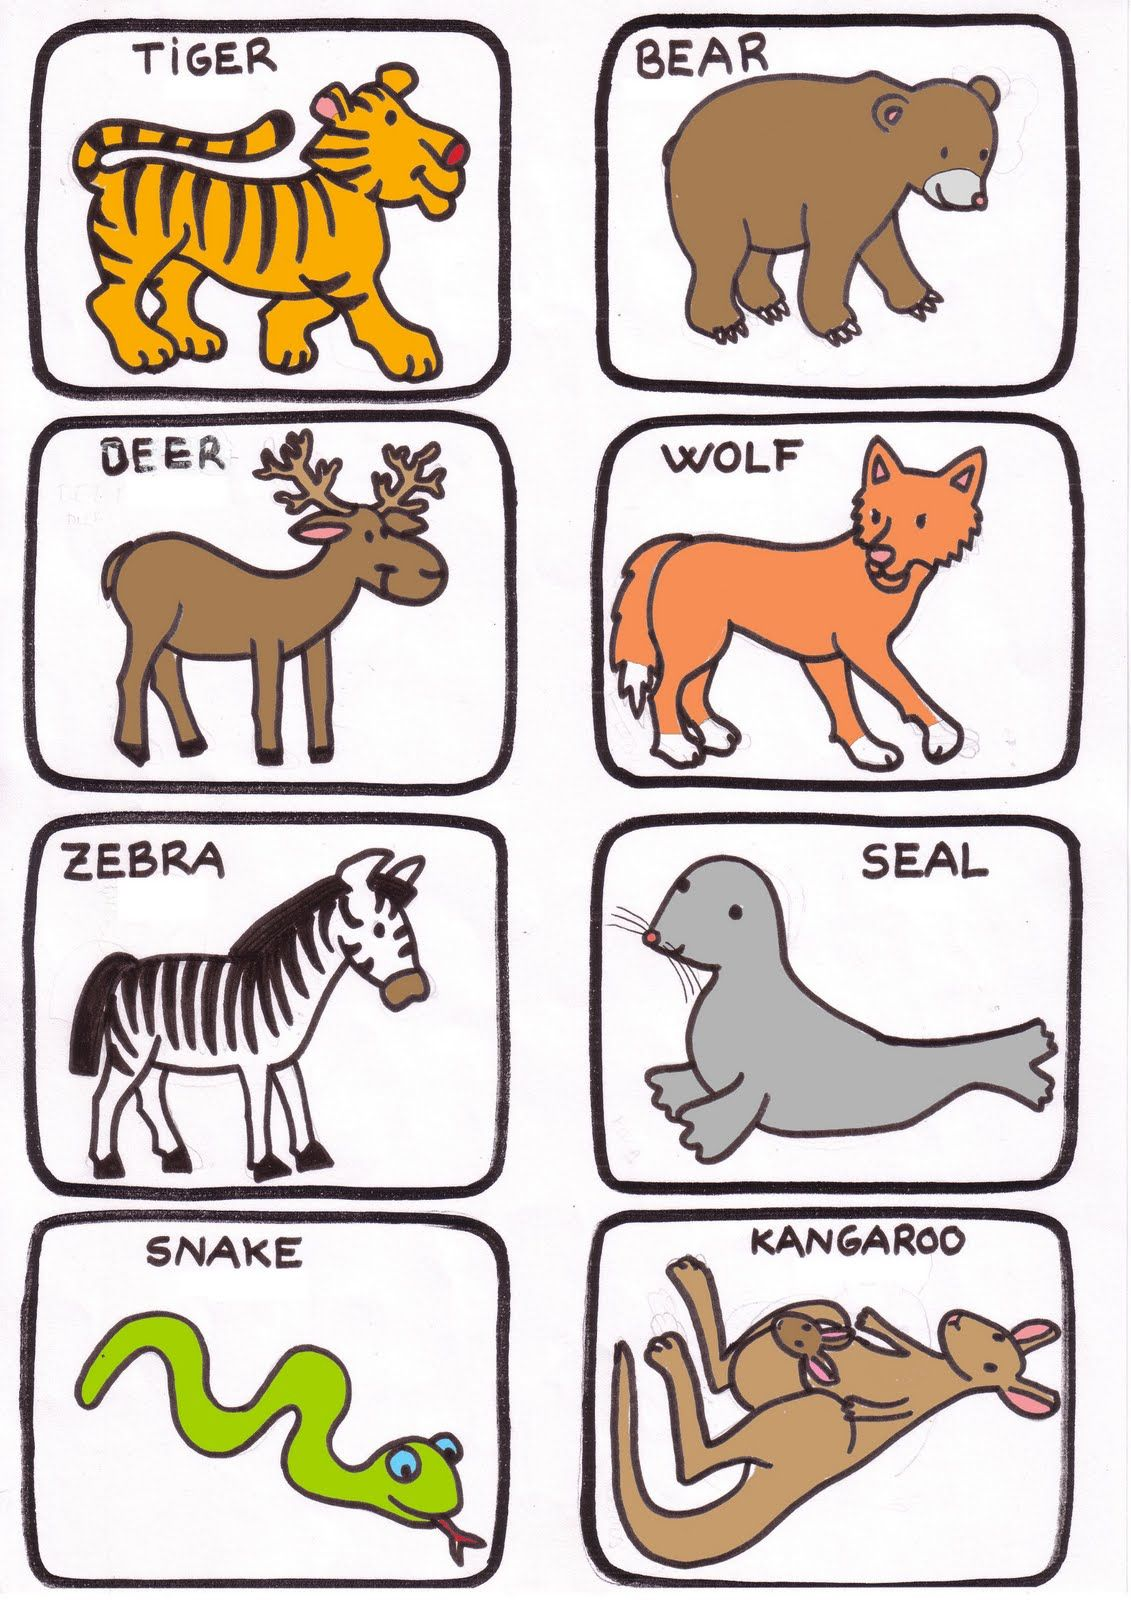 Animales salvajes en ingles  Imagui  Ideas  Pinterest  English